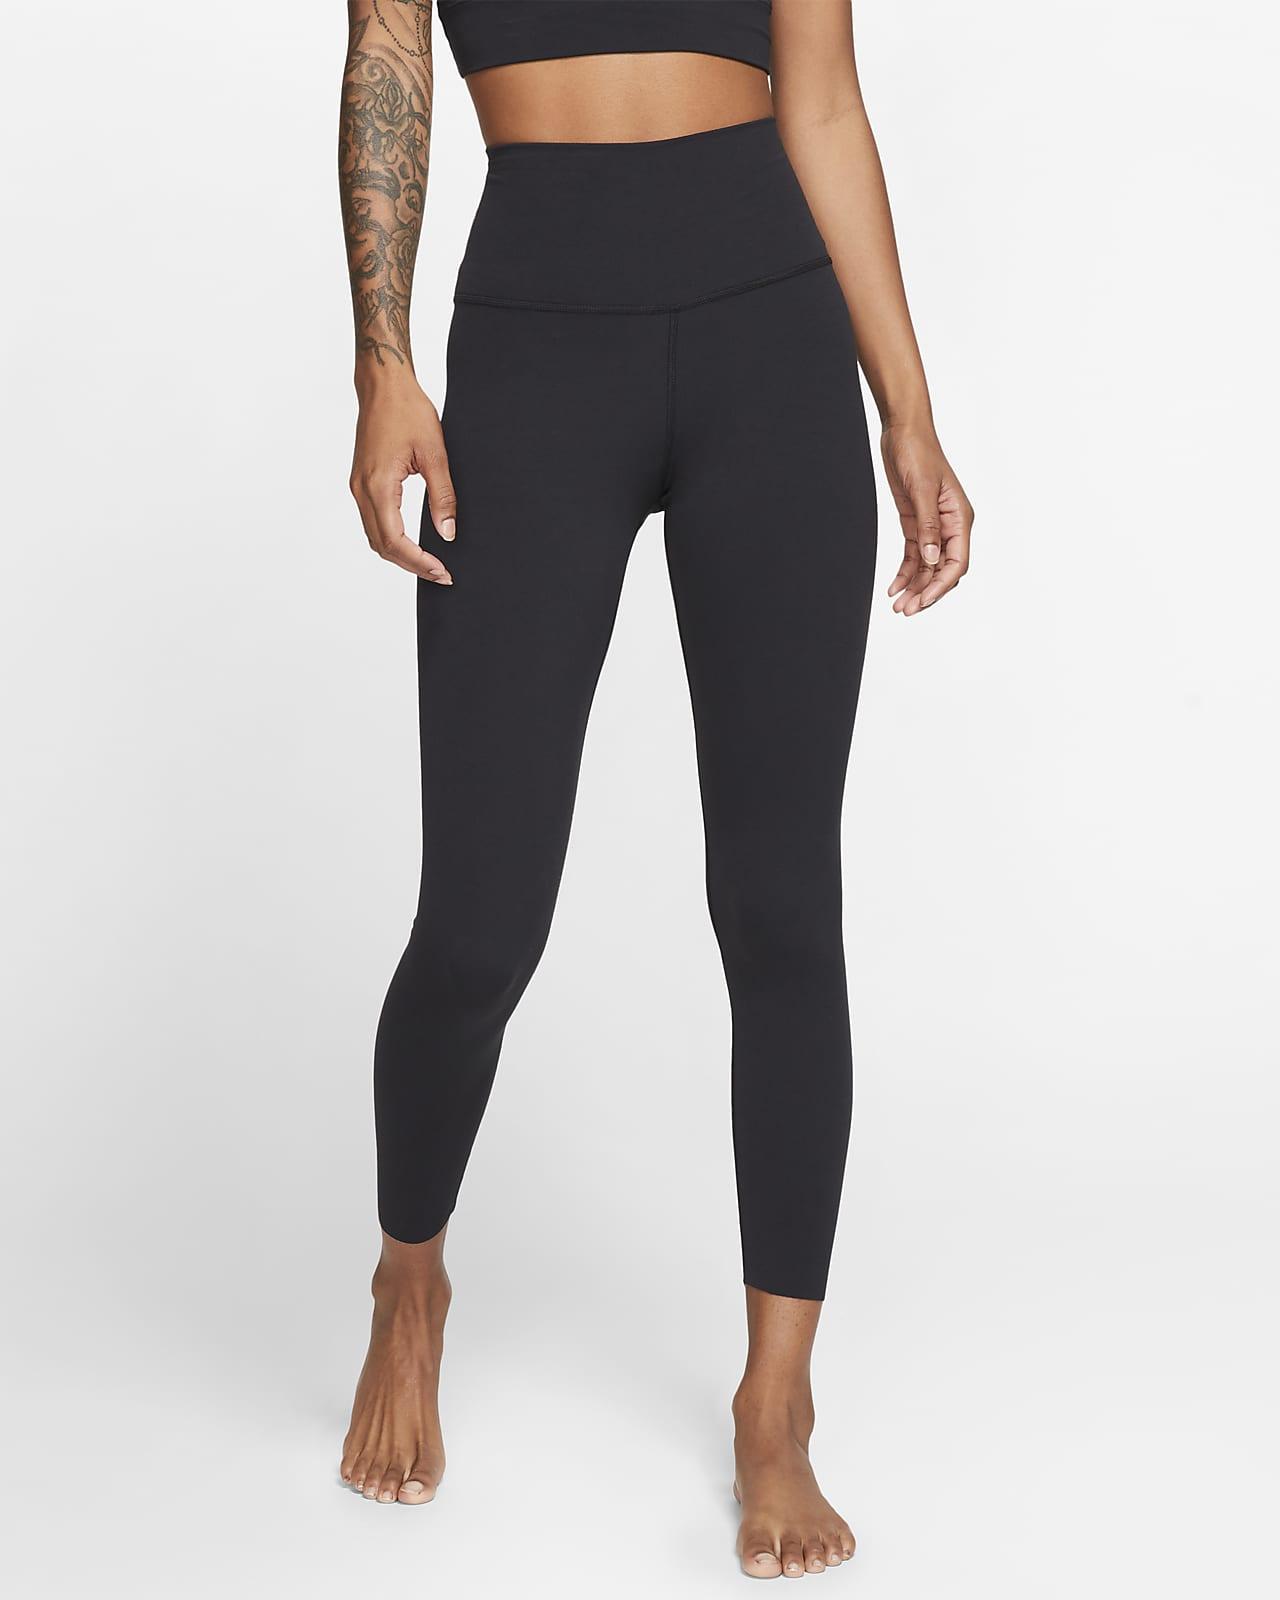 Dámské 7/8 legíny Nike Yoga Luxe zInfinalonu